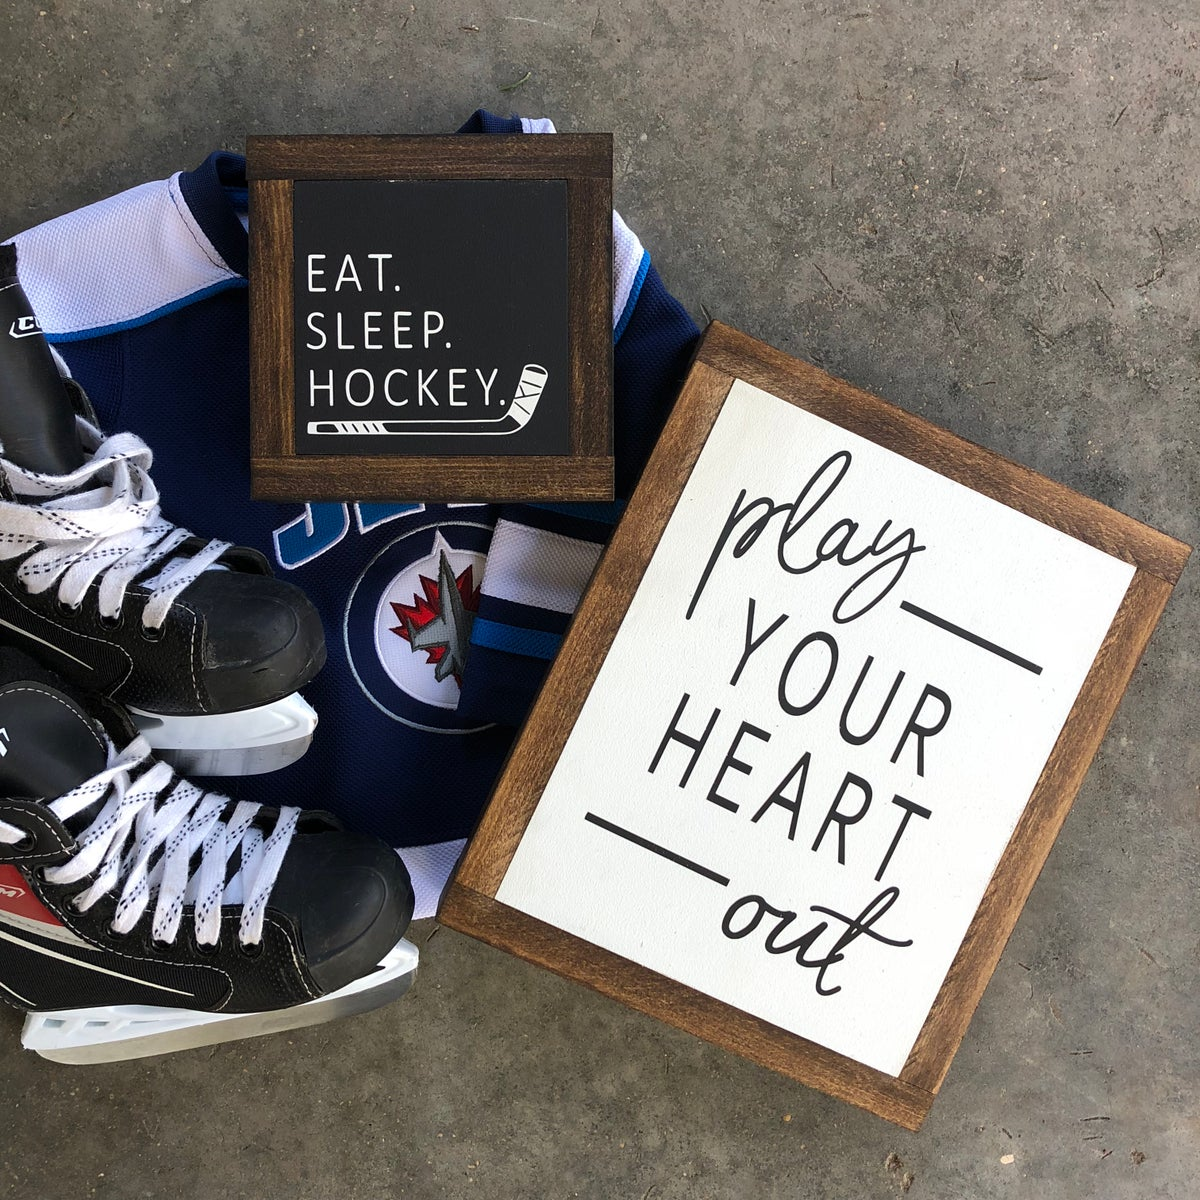 Image of Eat. Sleep. Hockey